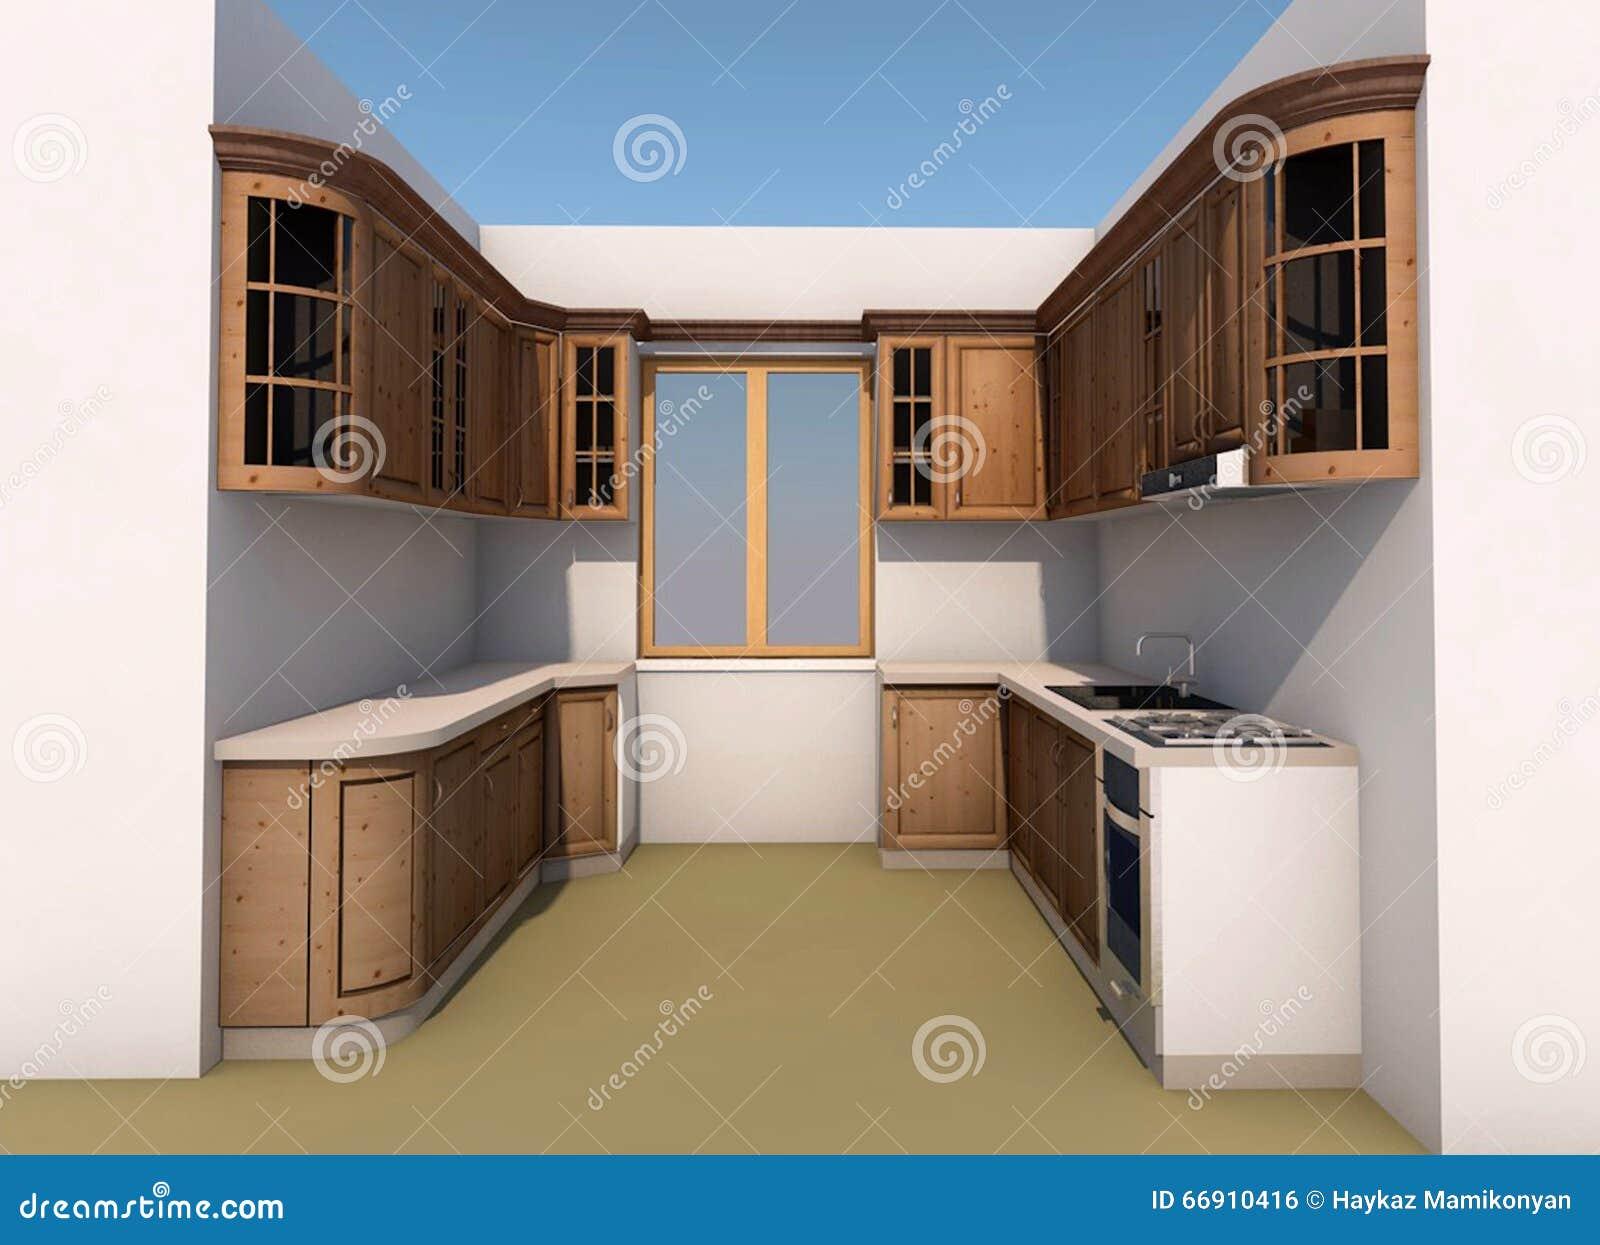 Archicad Artlantis Autocad Design Furniture Interior Kitchen